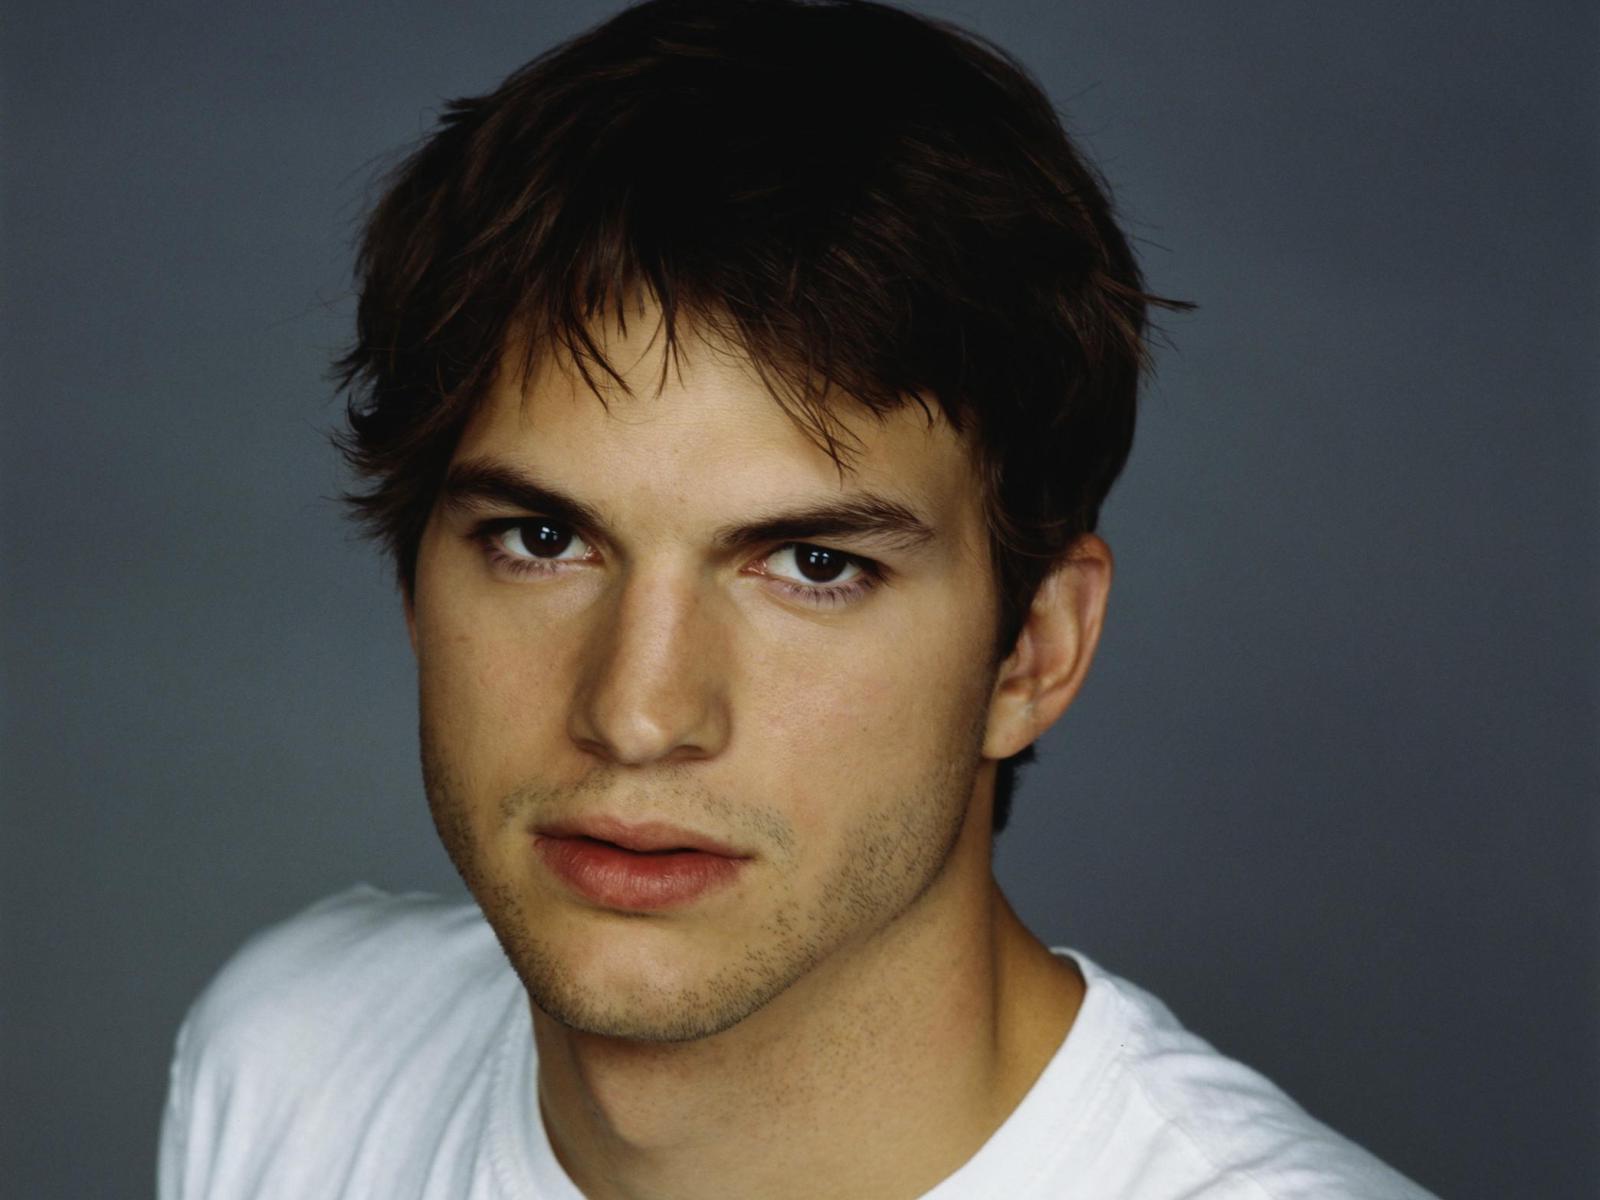 Ashton Kutcher 2014 HD Wallpaper Background Images 1600x1200